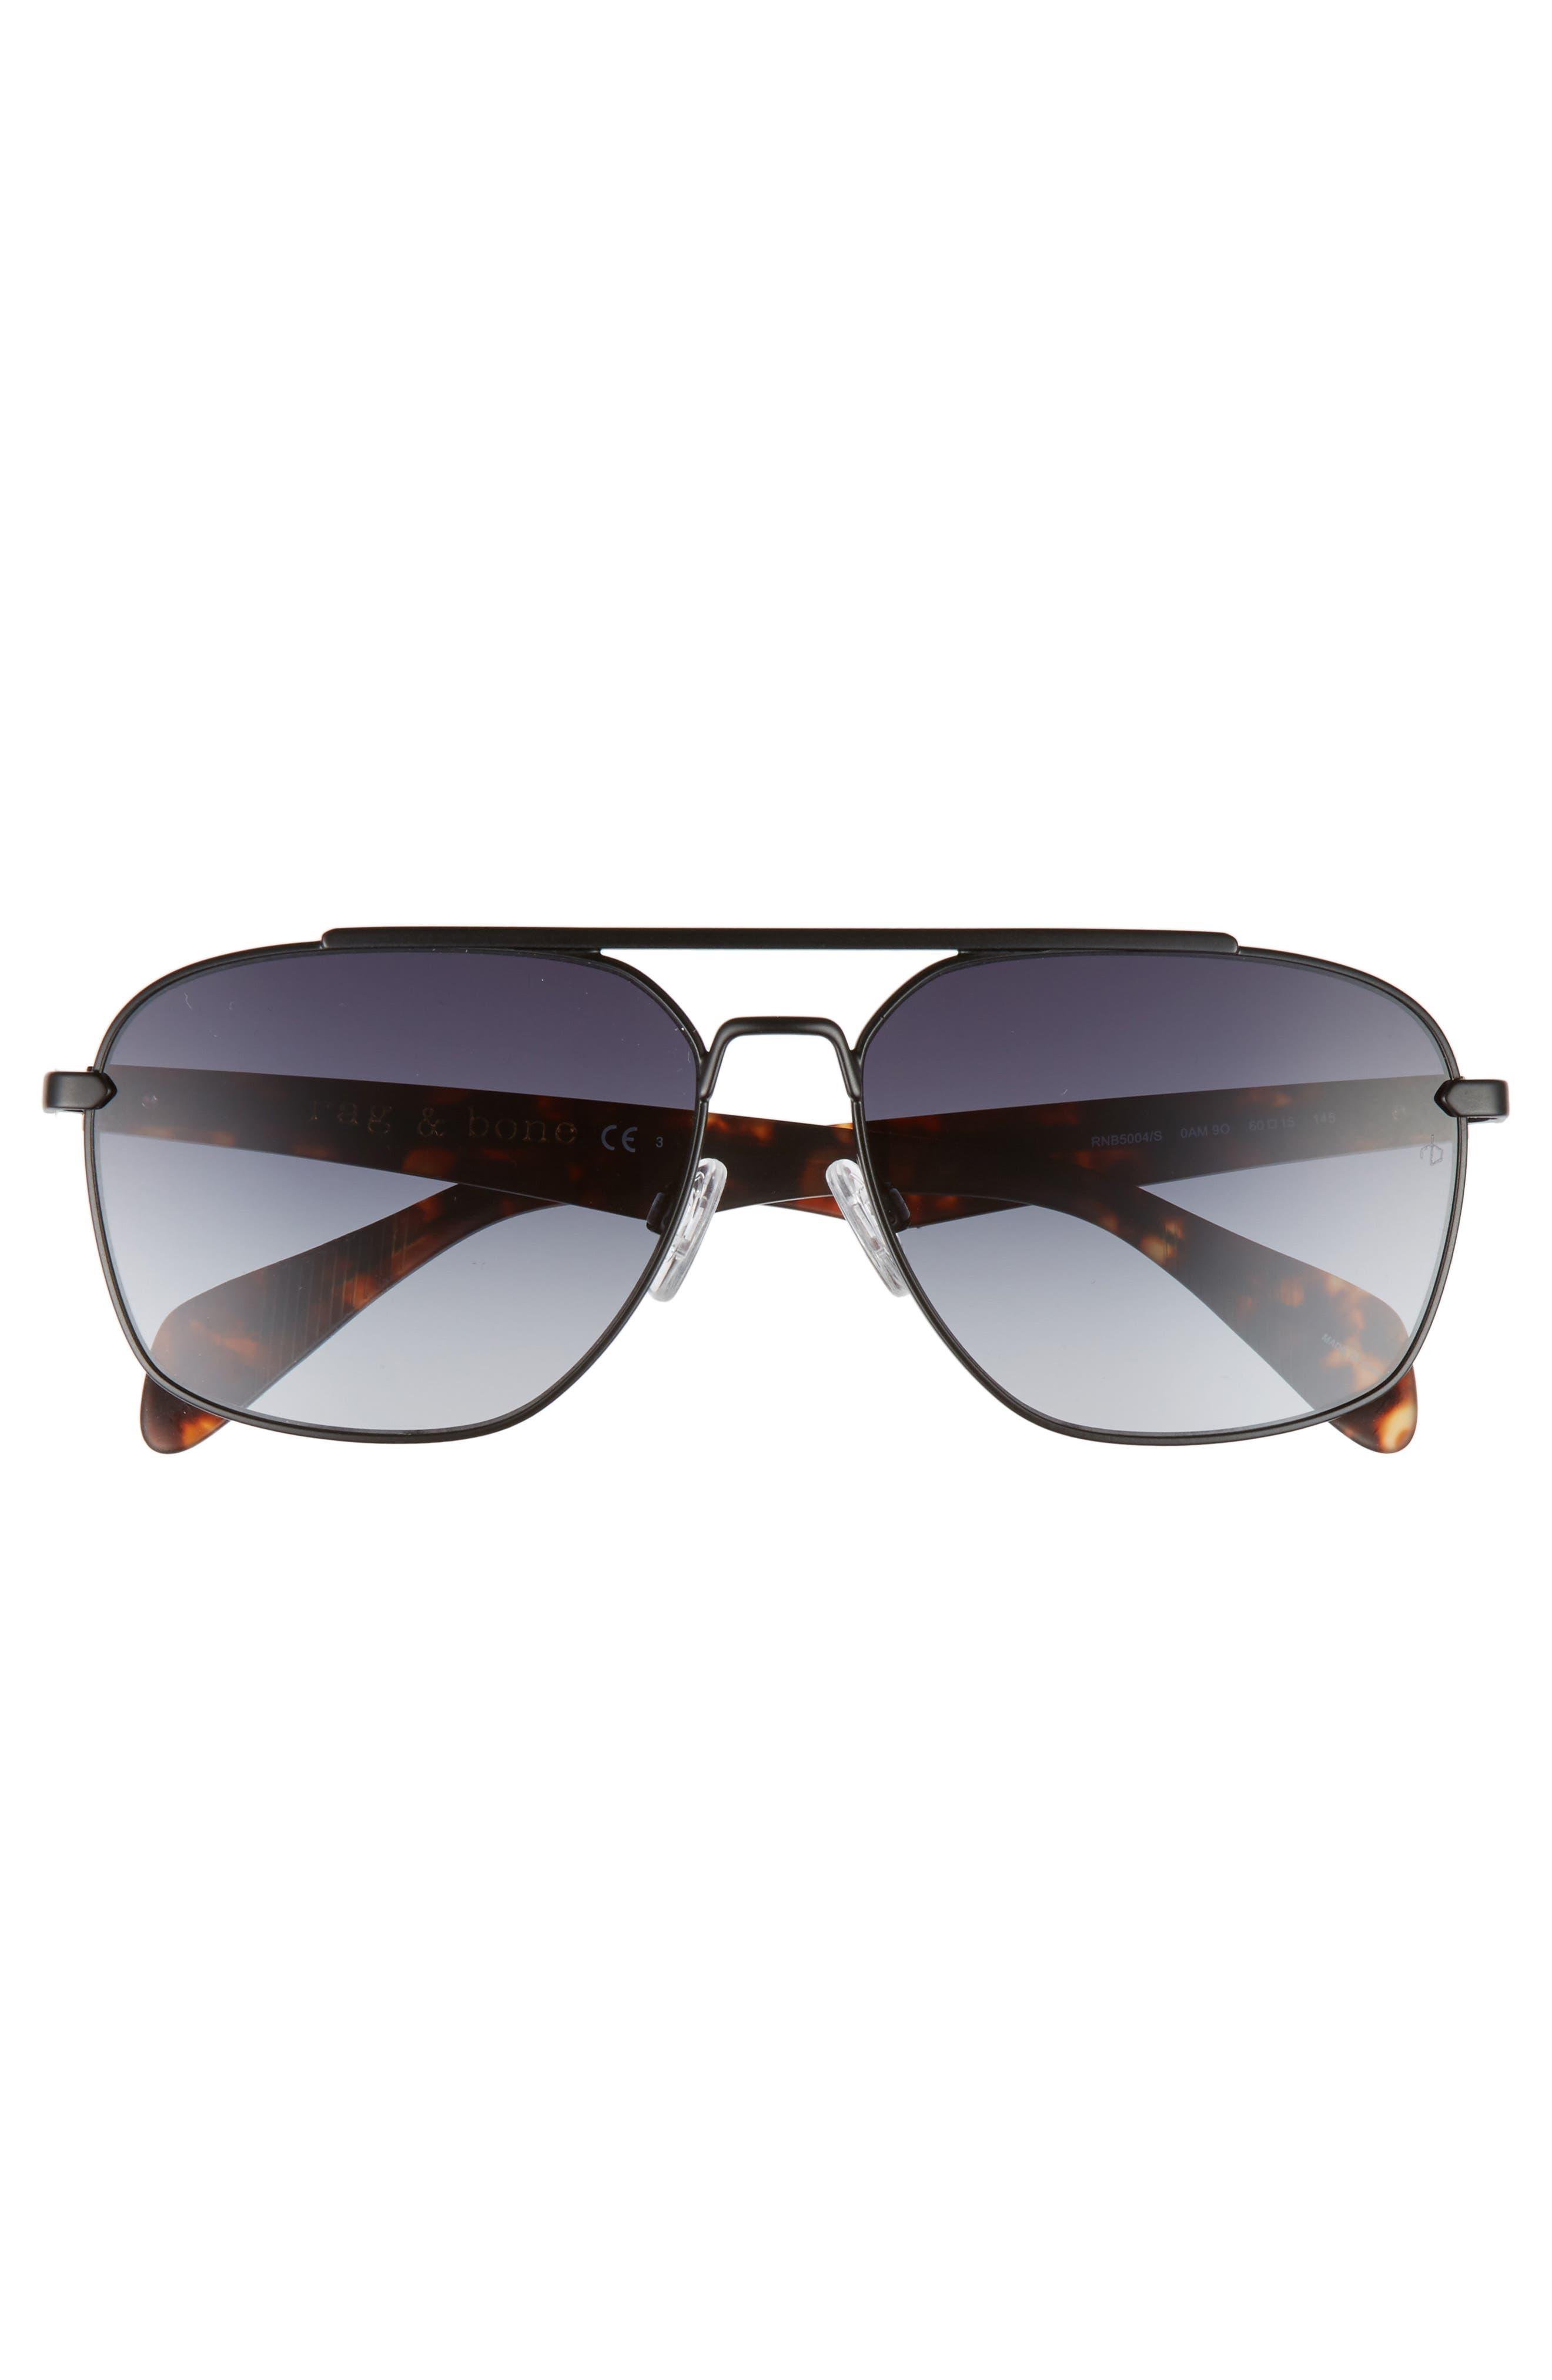 60mm Gradient Navigator Sunglasses,                             Alternate thumbnail 2, color,                             MATTE BLACK/ HAVANA